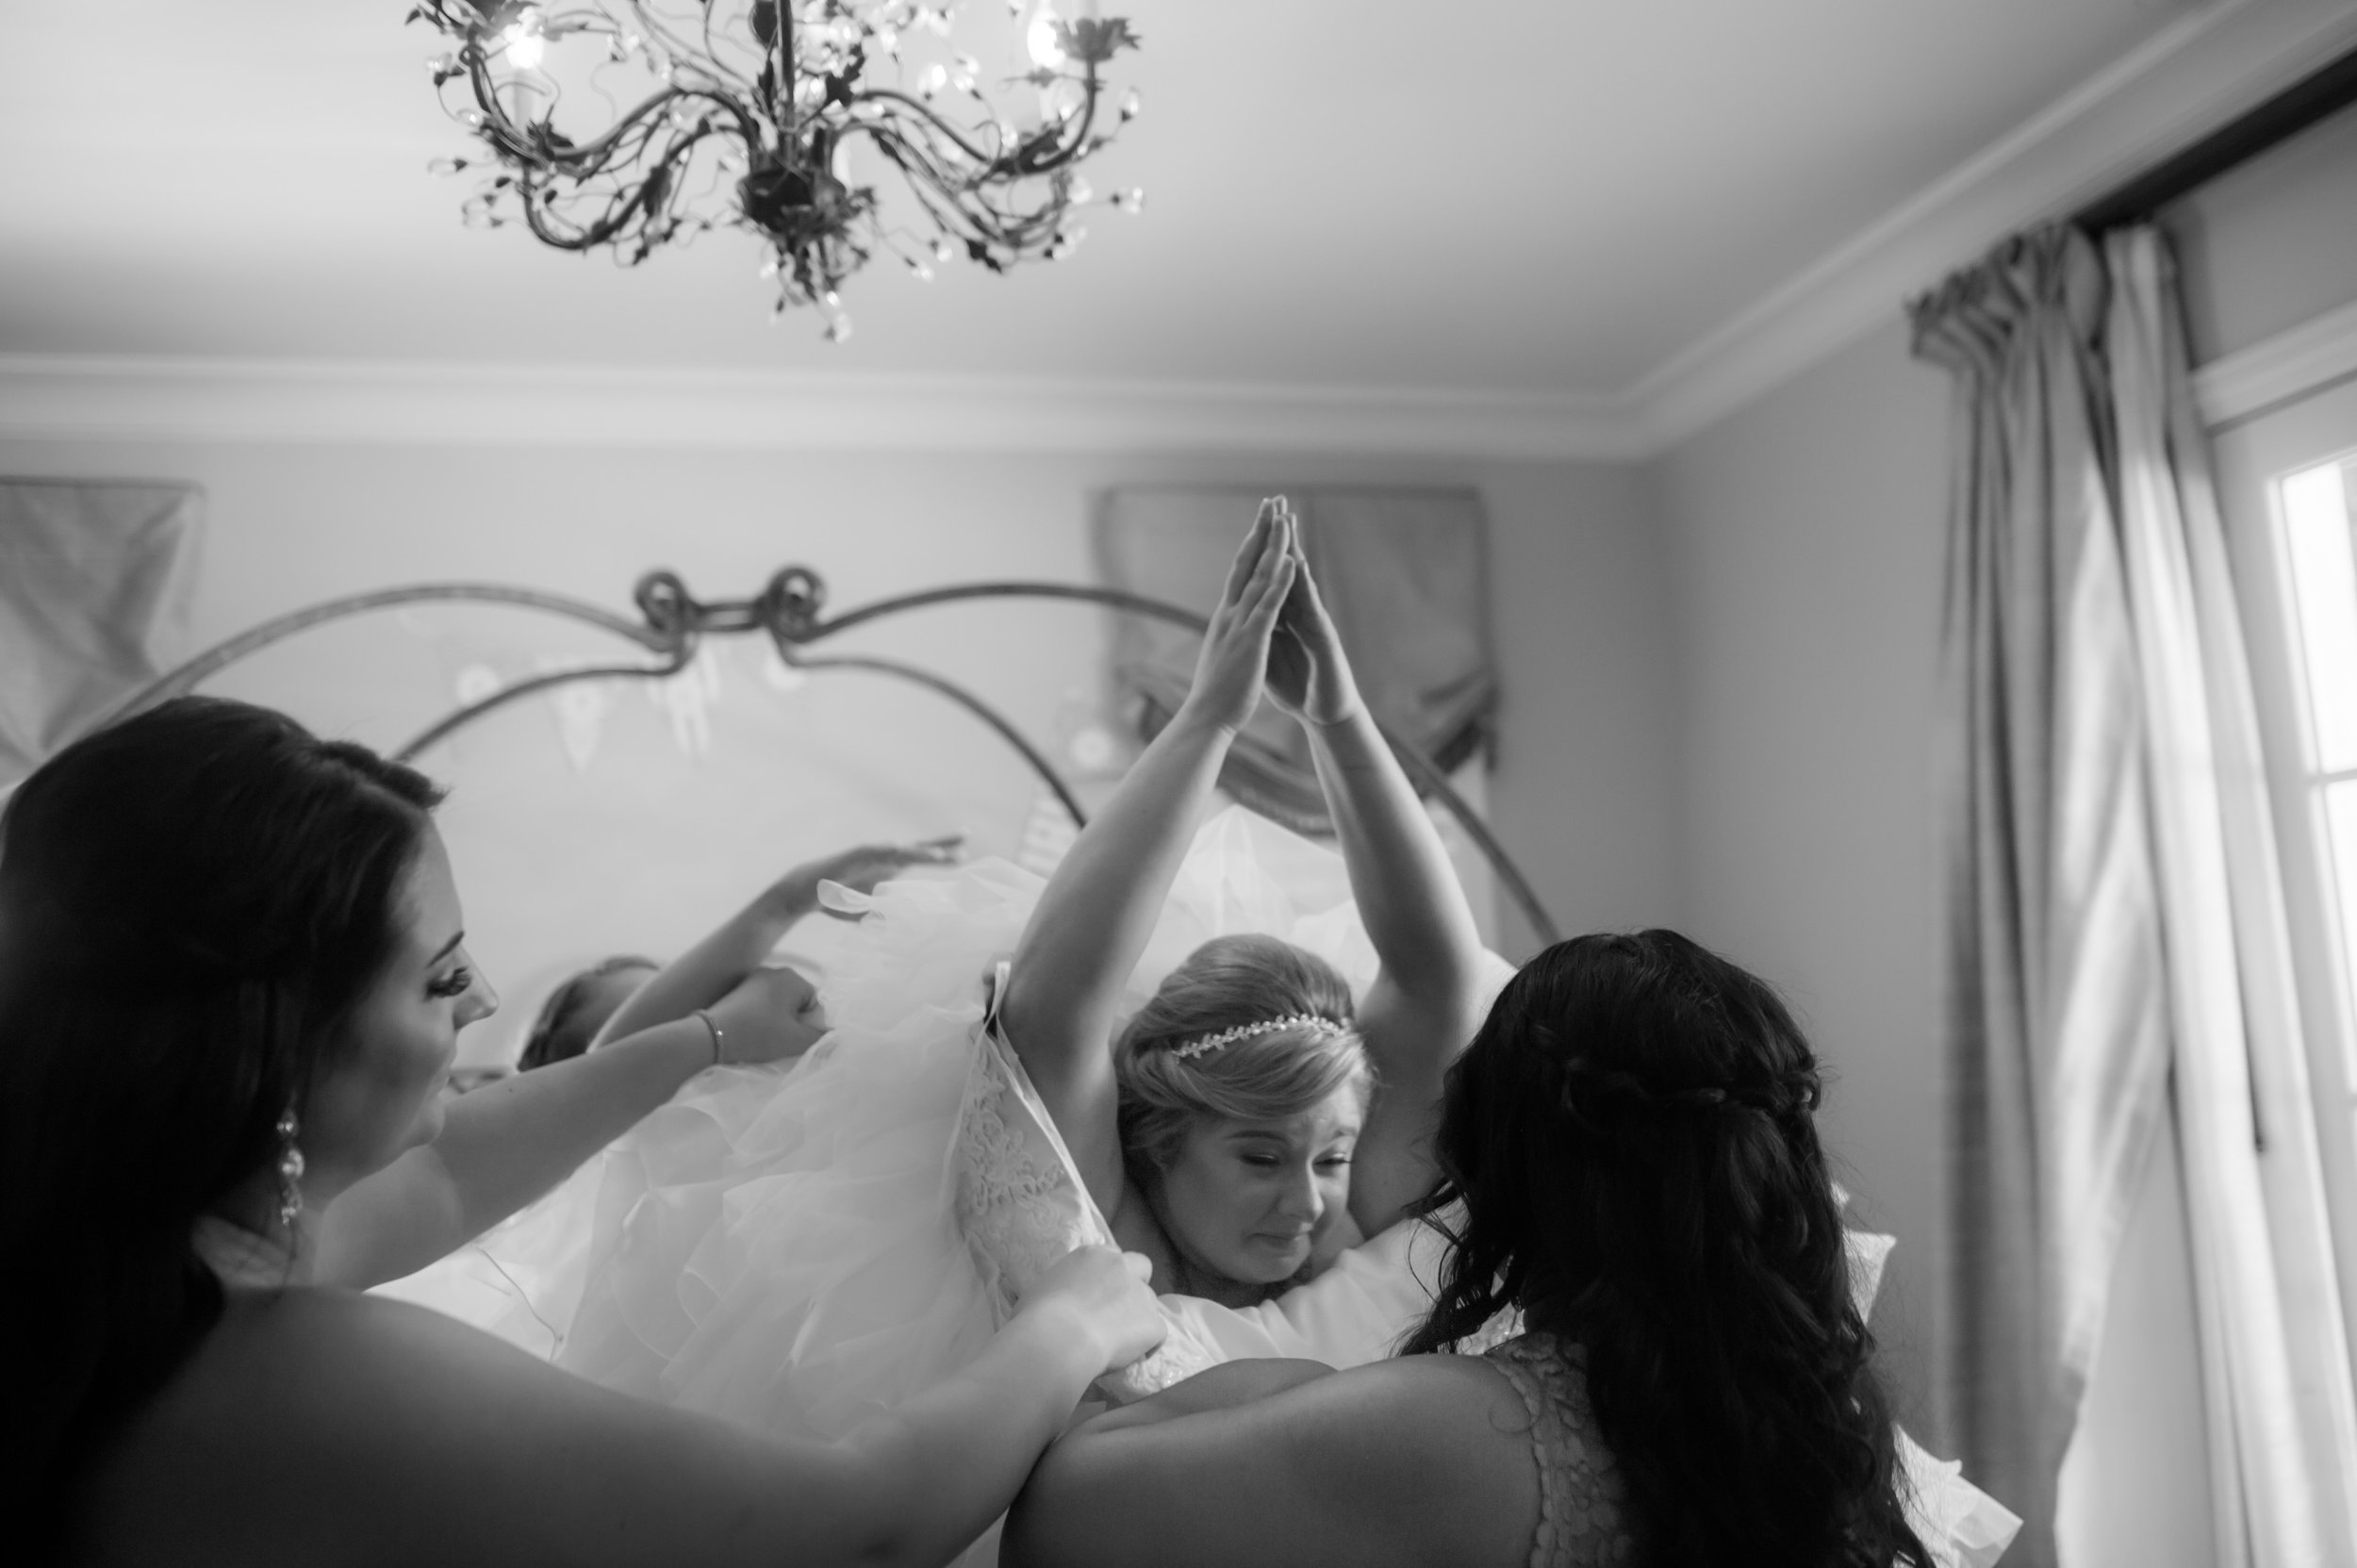 lyndzie-javier-006-arden-hills-sacramento-wedding-photographer-katherine-nicole-photography.JPG